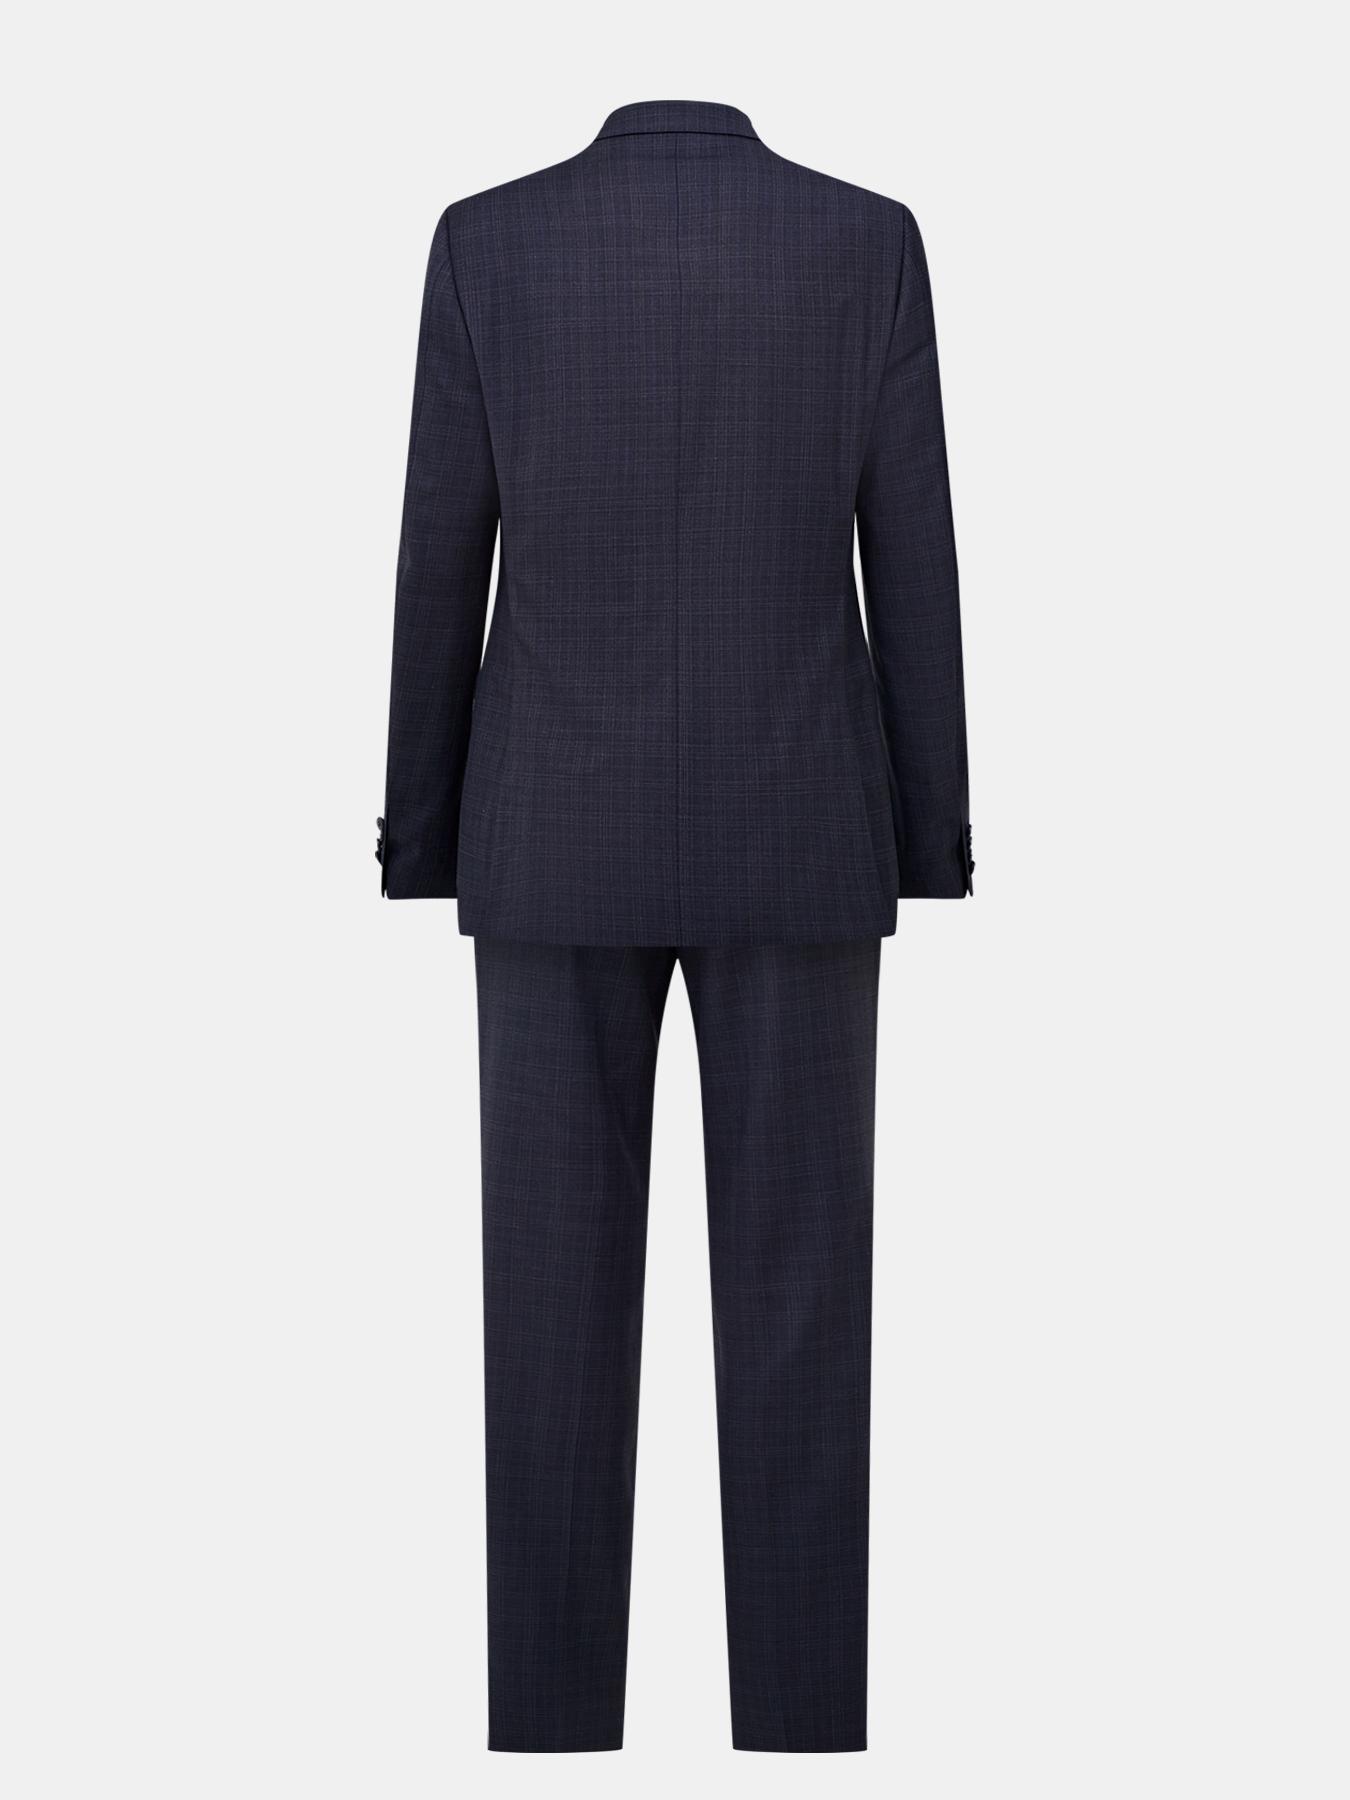 Костюм Korpo Классический костюм костюм классический laconi laconi mp002xm240i9